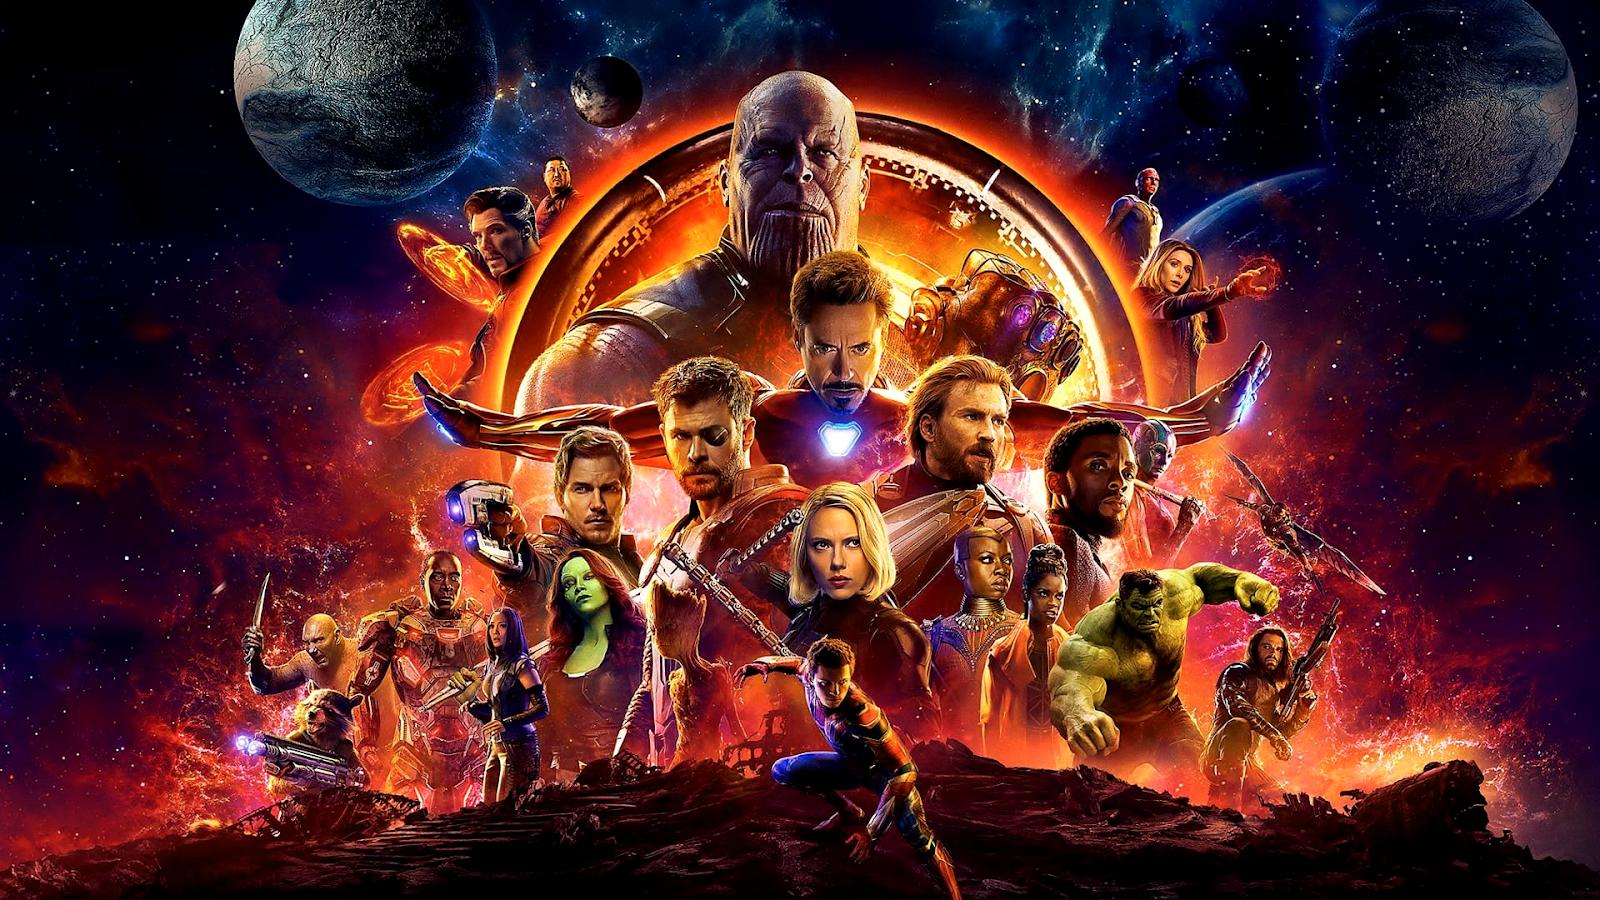 Free Download Avengers Infinity War 1920x1080 Wallpapers